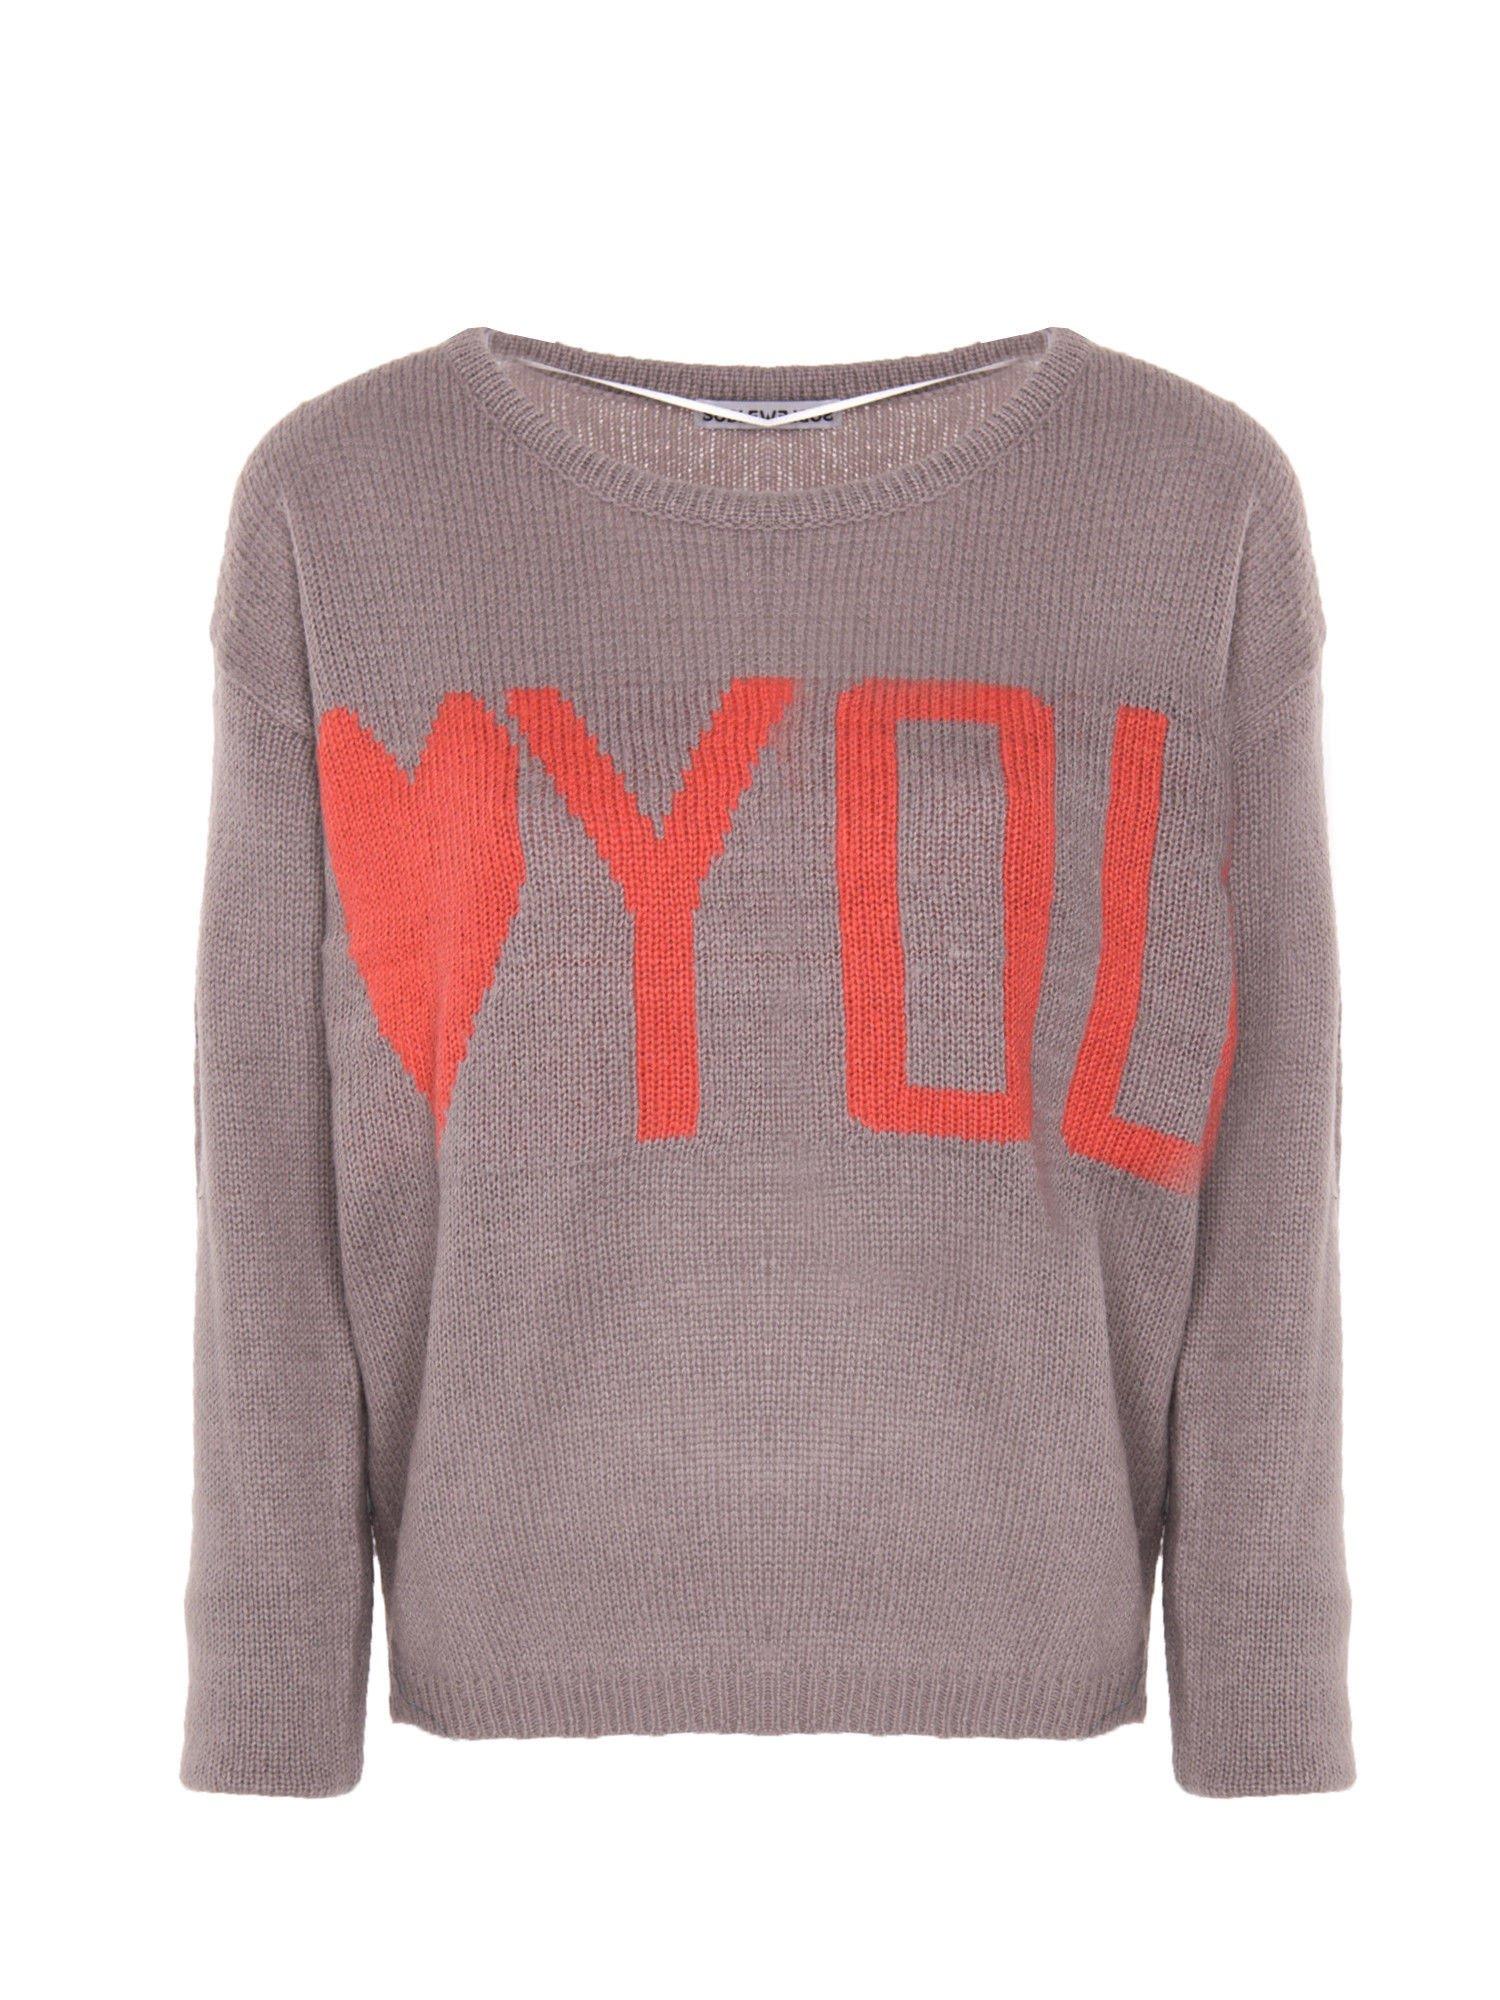 Szary sweter z sercem i napisem YOU                                  zdj.                                  1